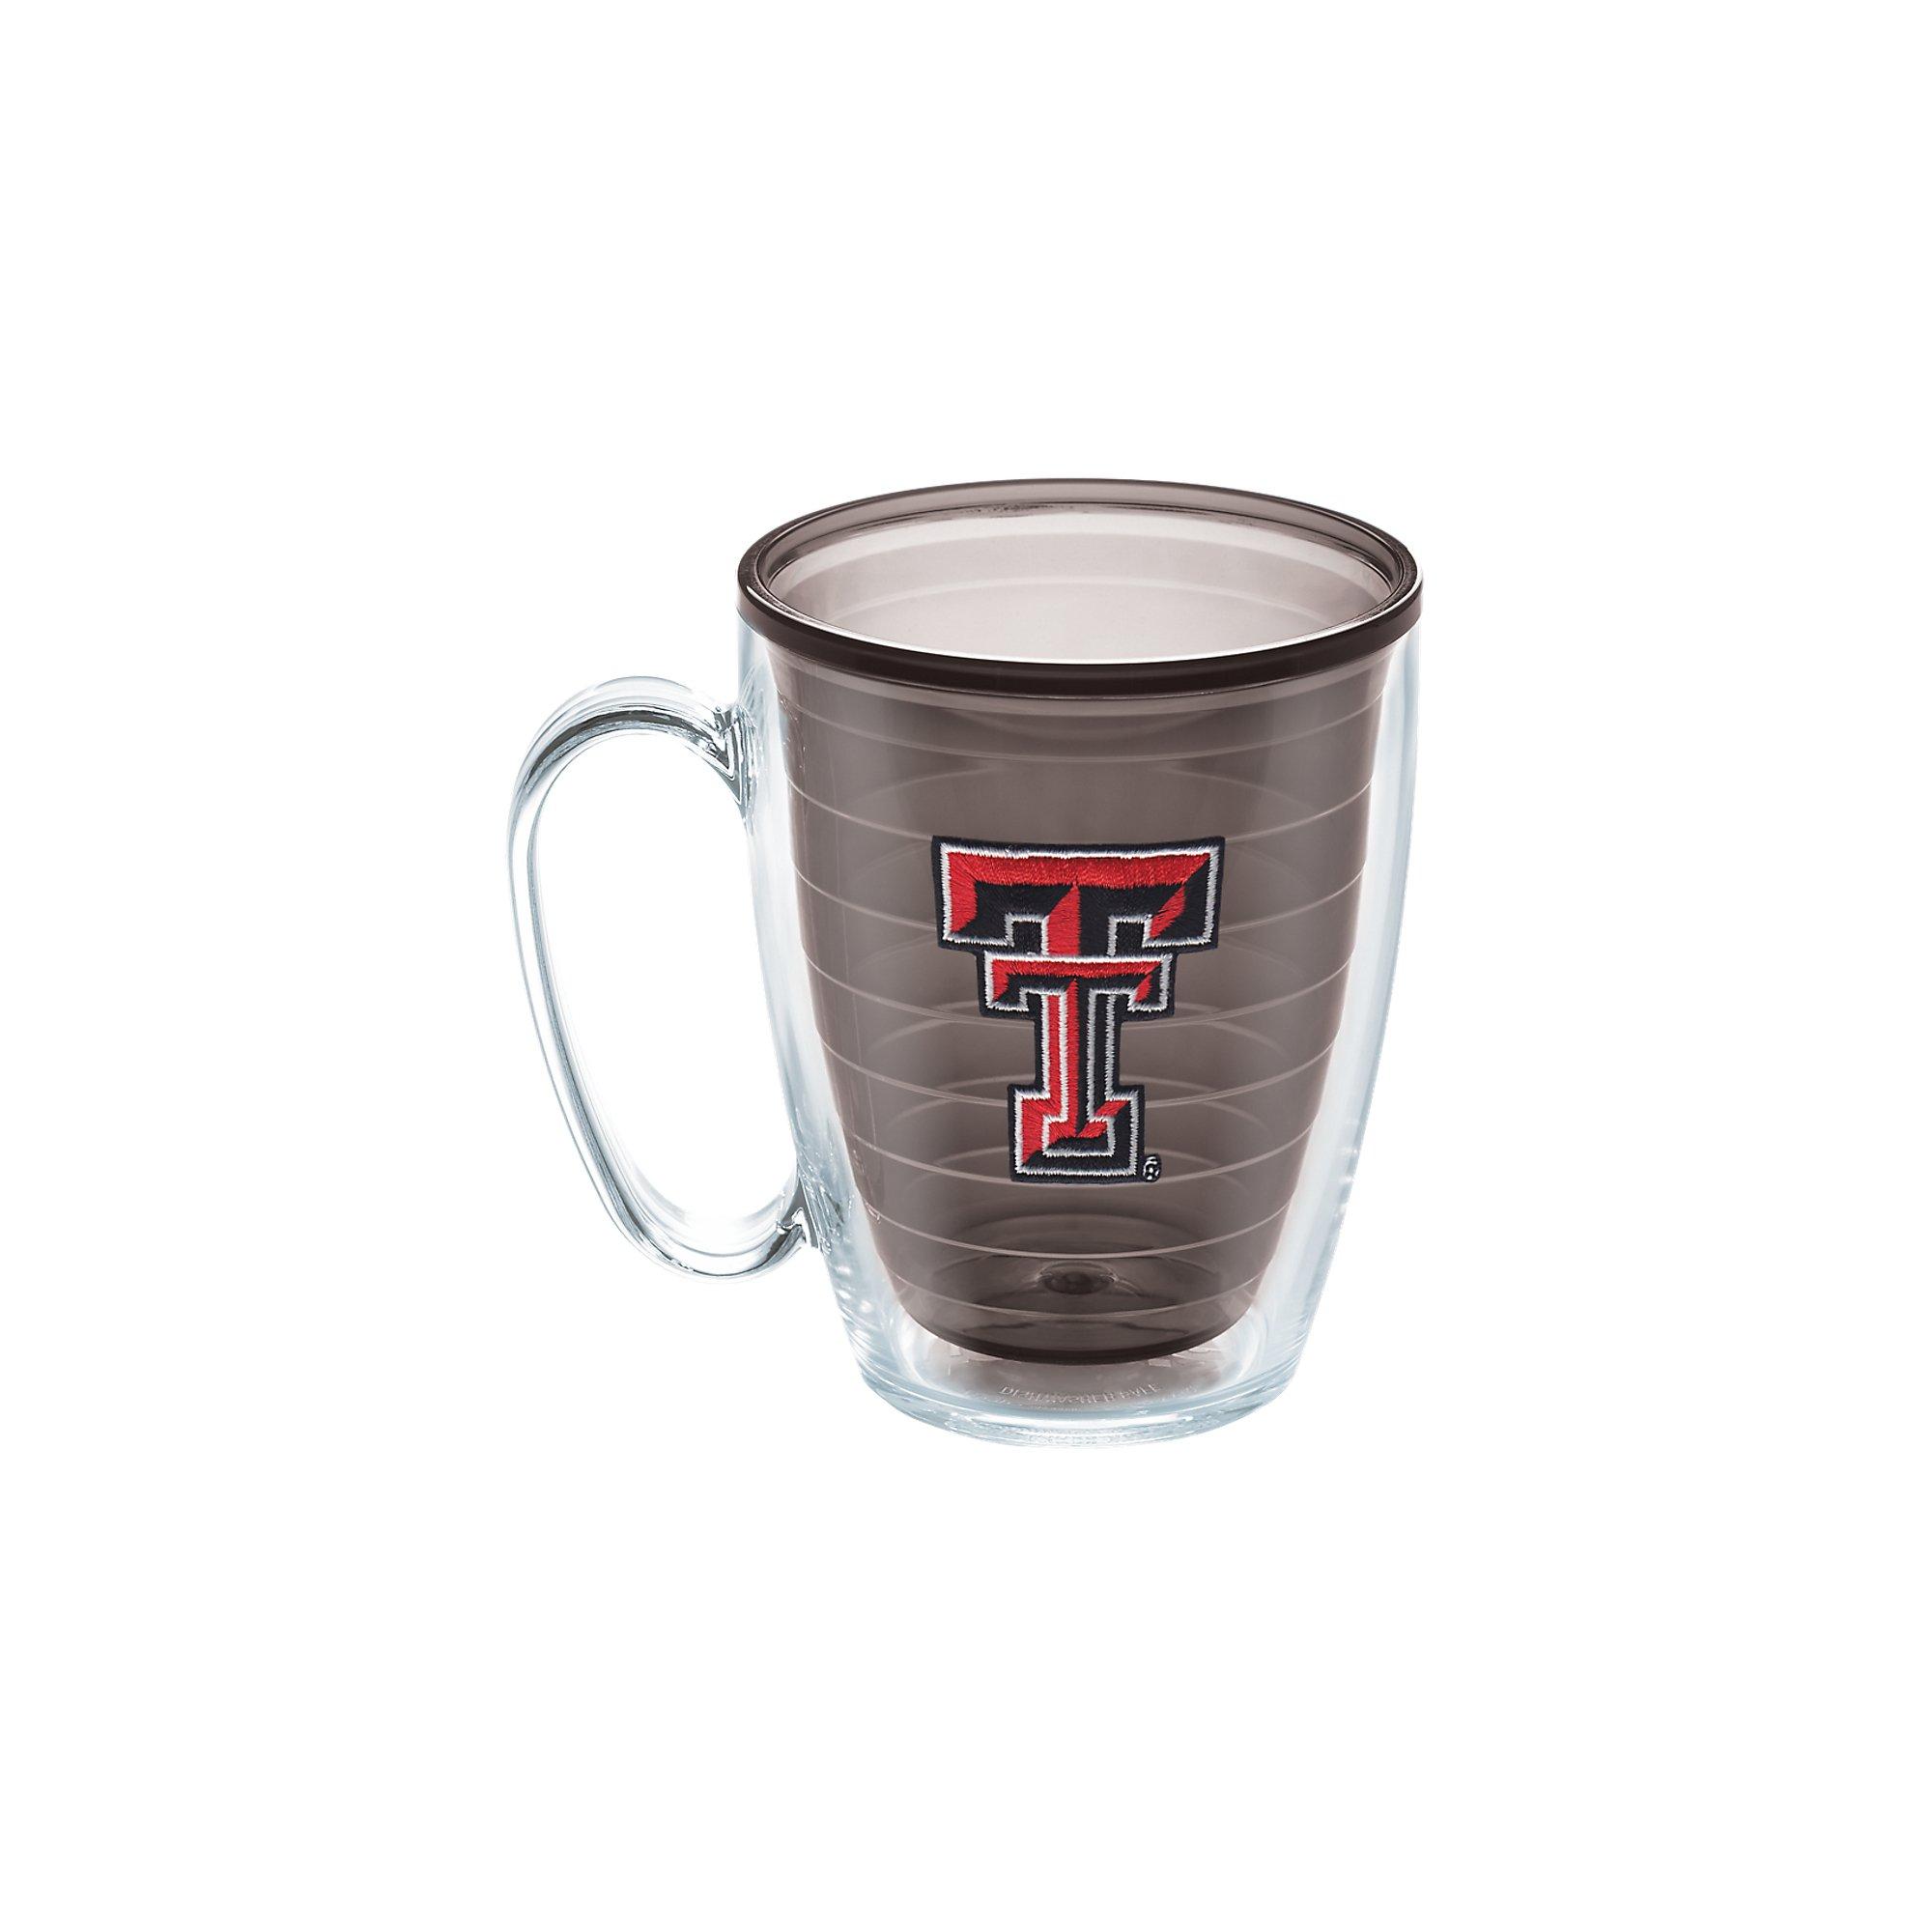 Tervis Texas Tech University Emblem Individual Mug, 16 oz, Quartz - 1095818